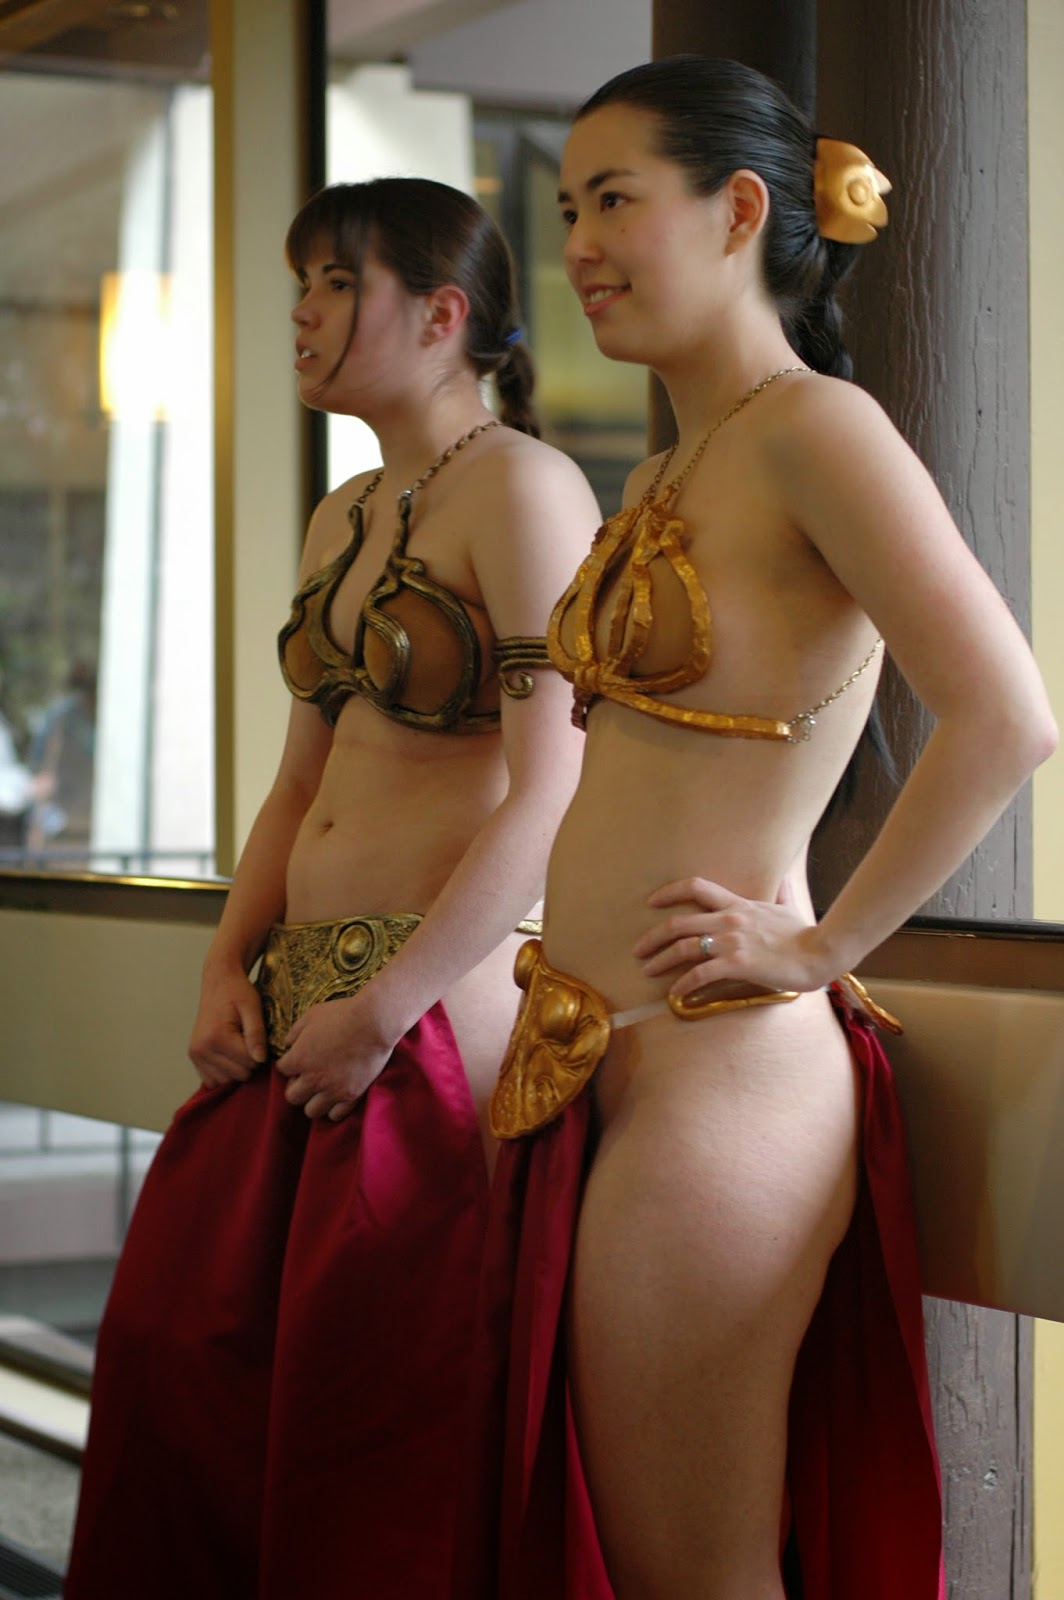 Princess warrior nude pissy sex videos